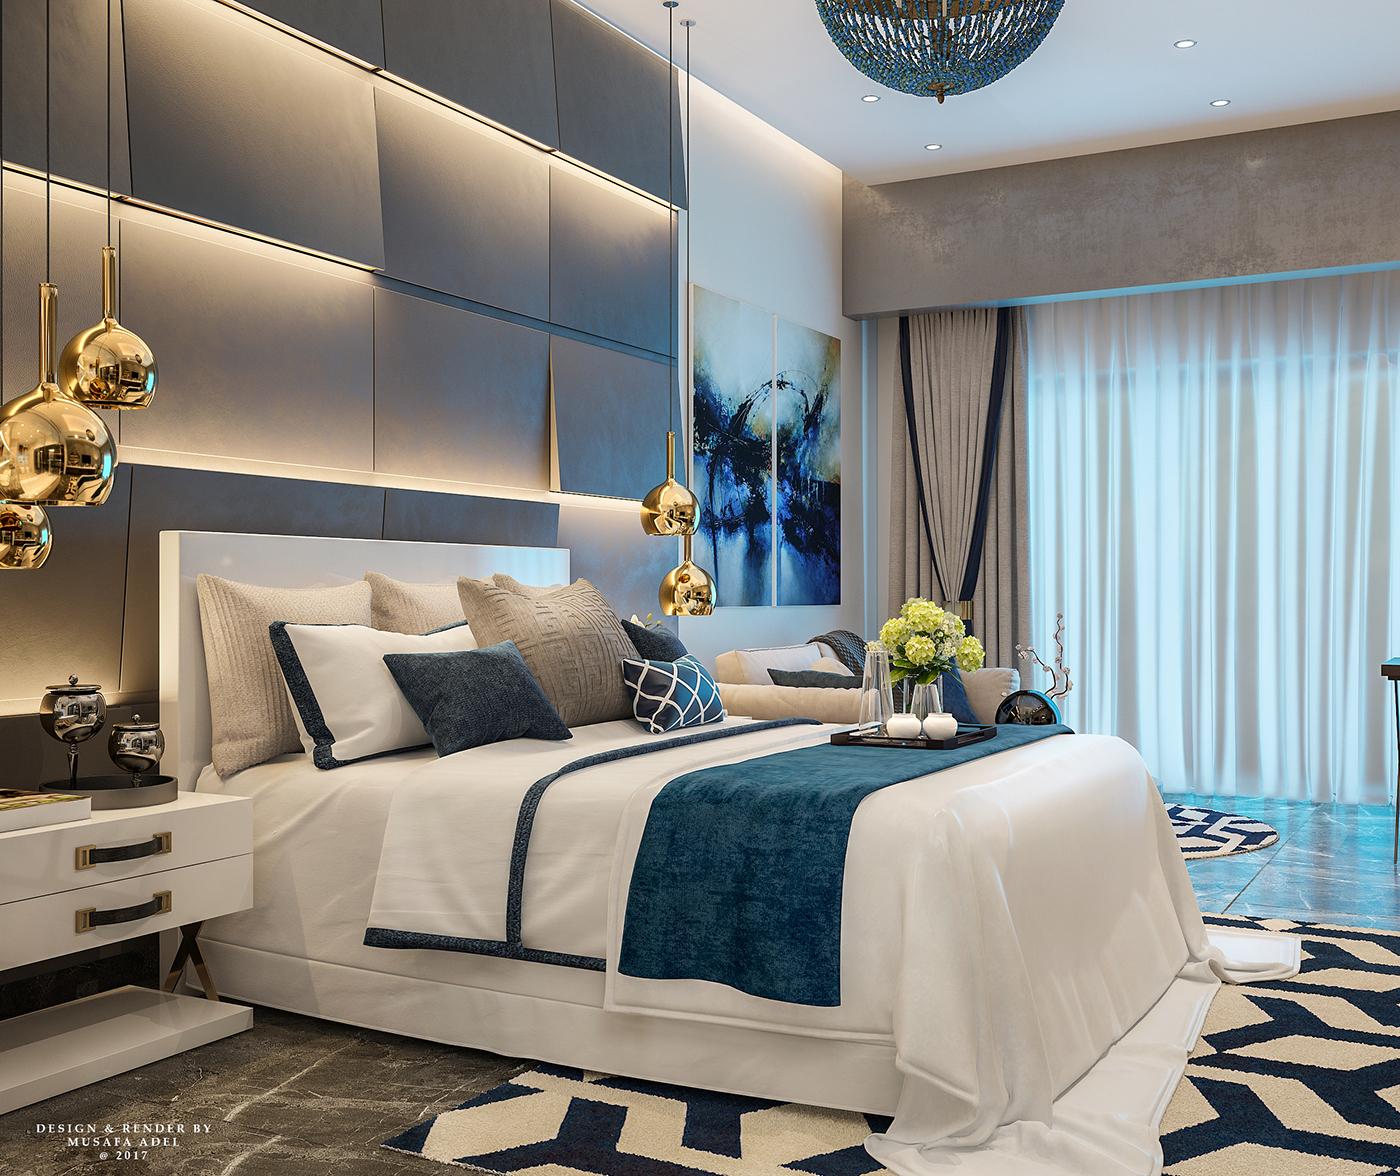 Modern Hotel Rooms on Behance